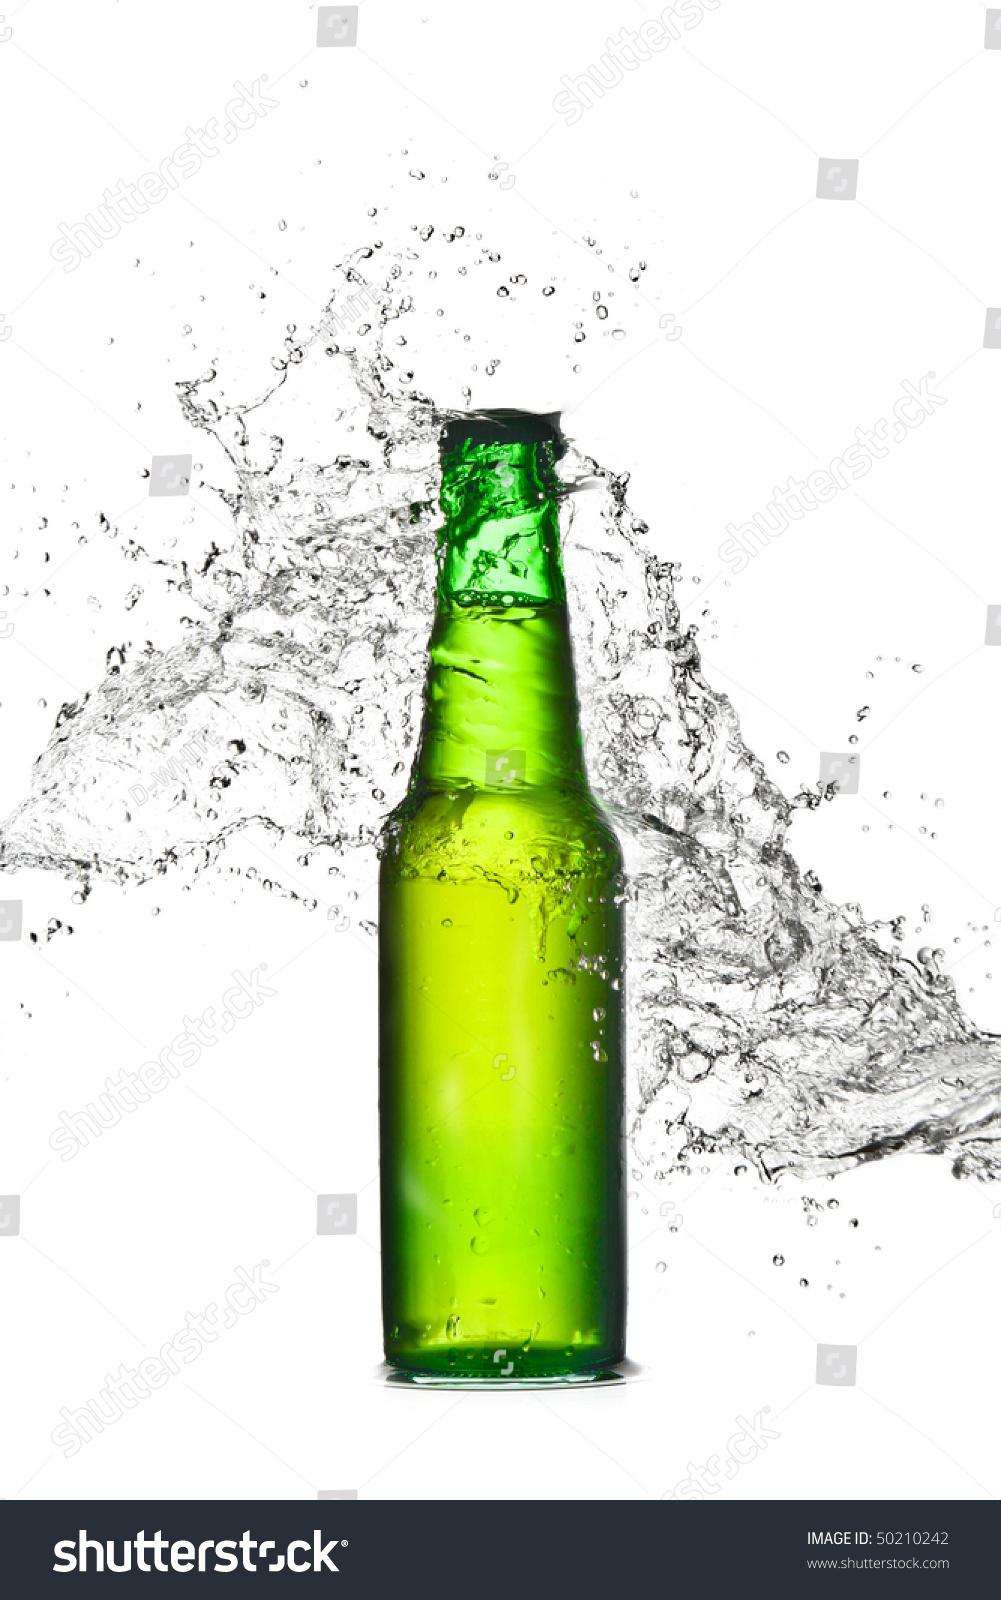 beer bottle fresh splash stock photo 50210242 shutterstock. Black Bedroom Furniture Sets. Home Design Ideas